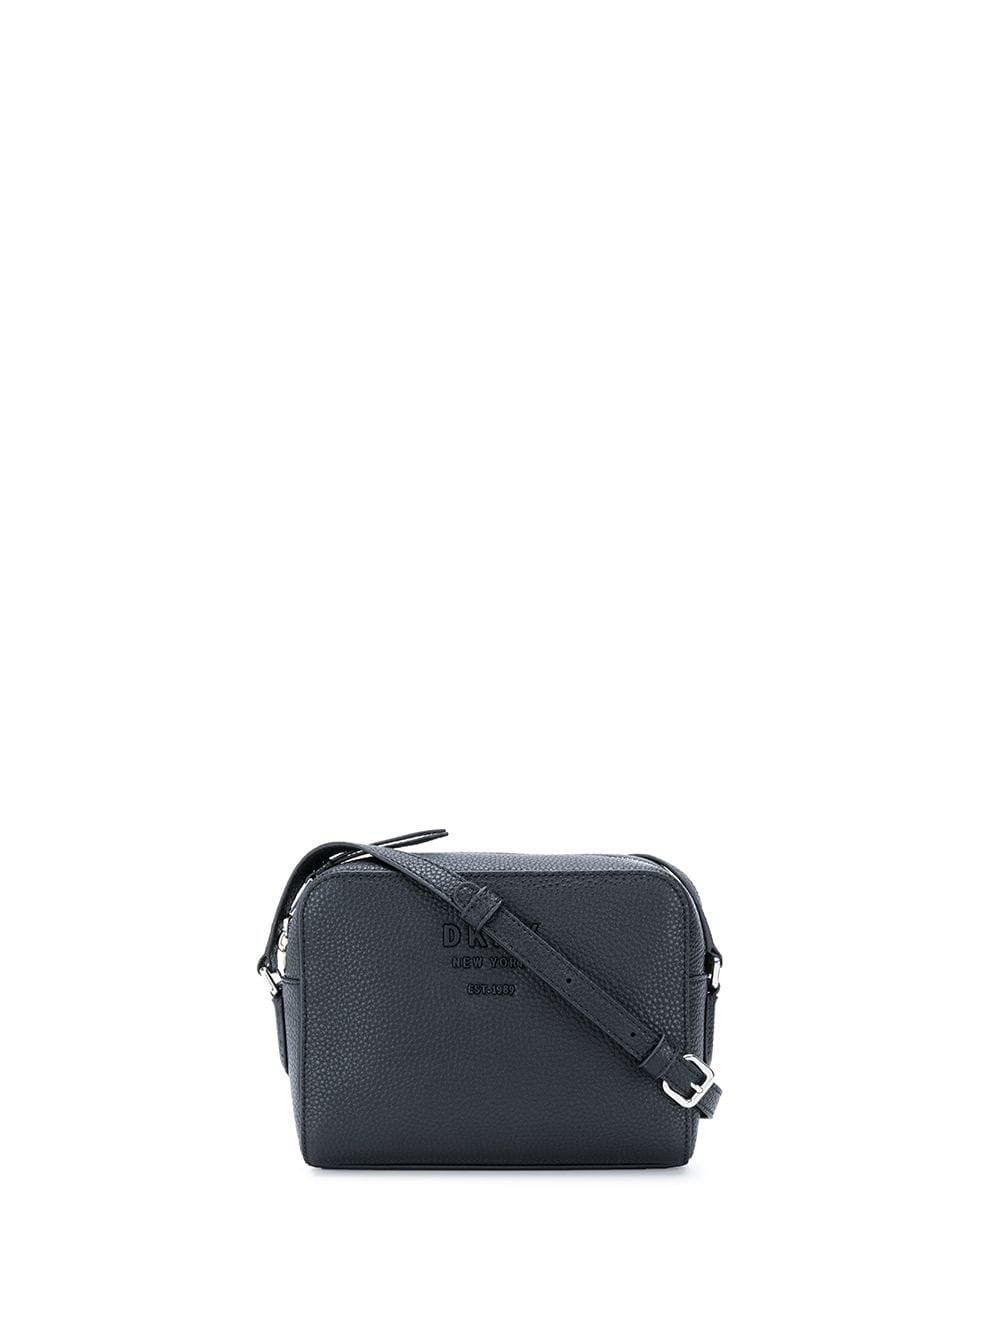 76f5526499 Dkny Small Cross Body Bag - Black